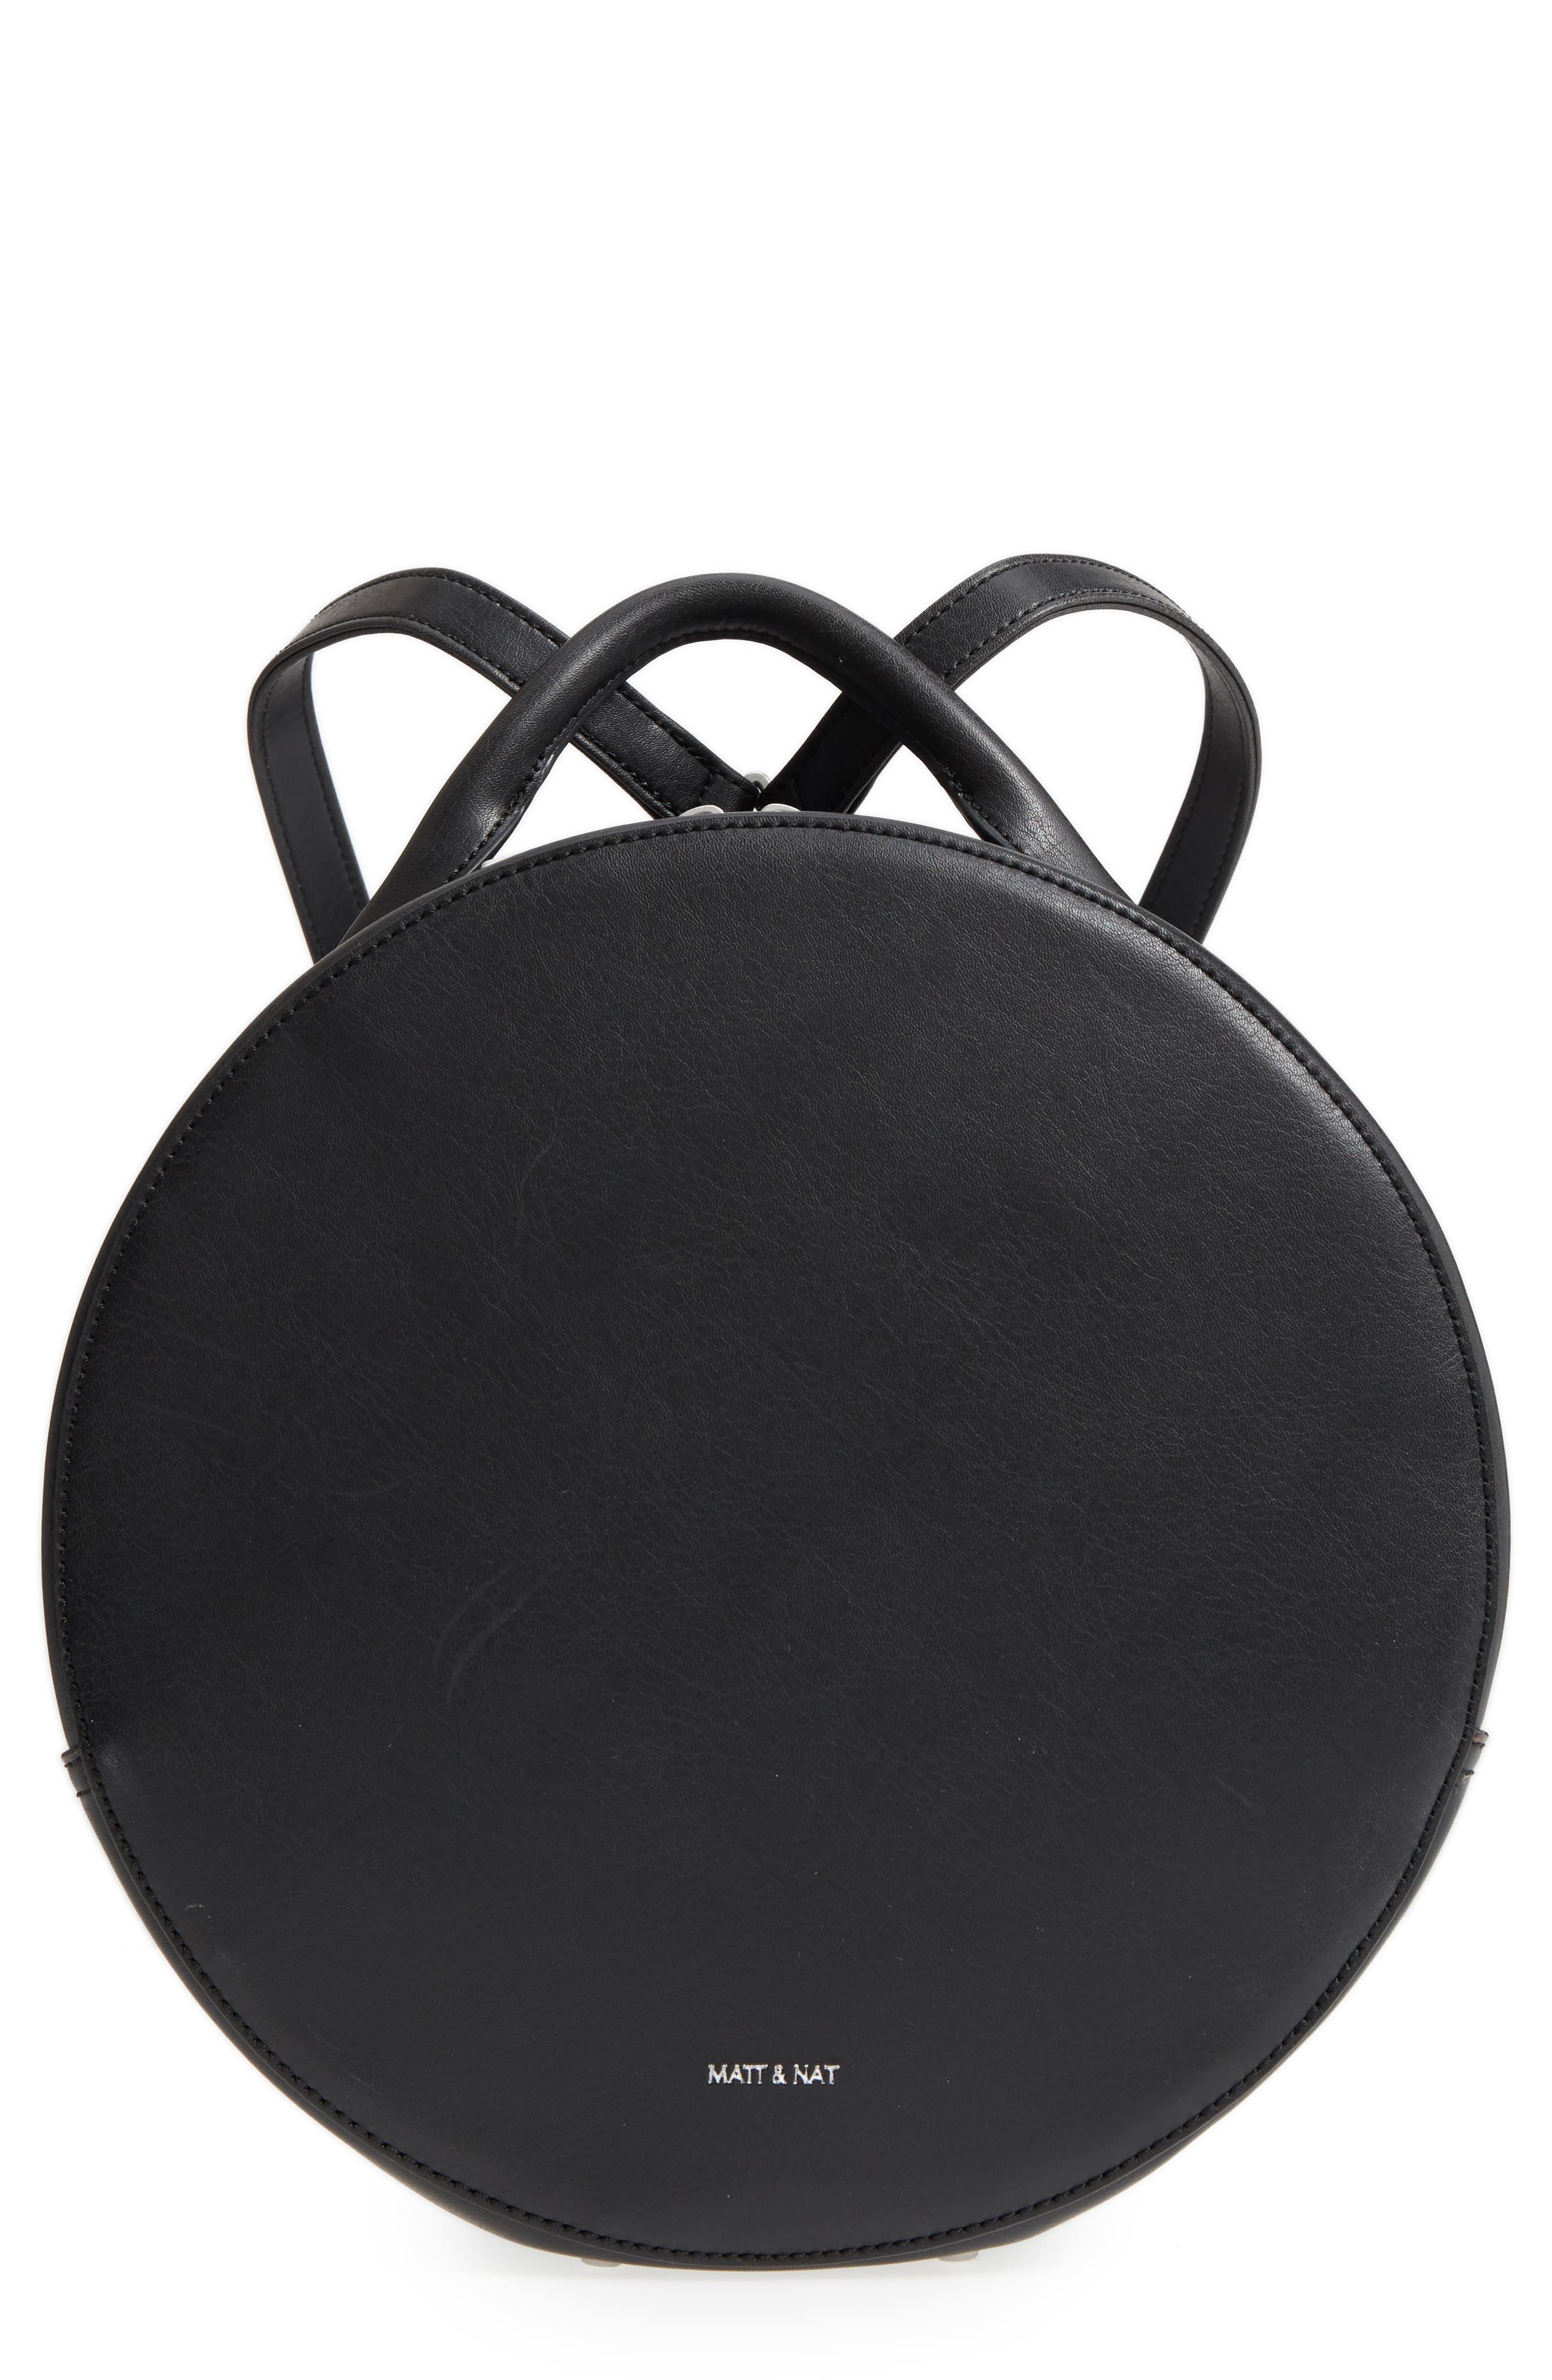 MATT & NAT Kiara Faux Leather Circle Backpack, Main, color, BLACK